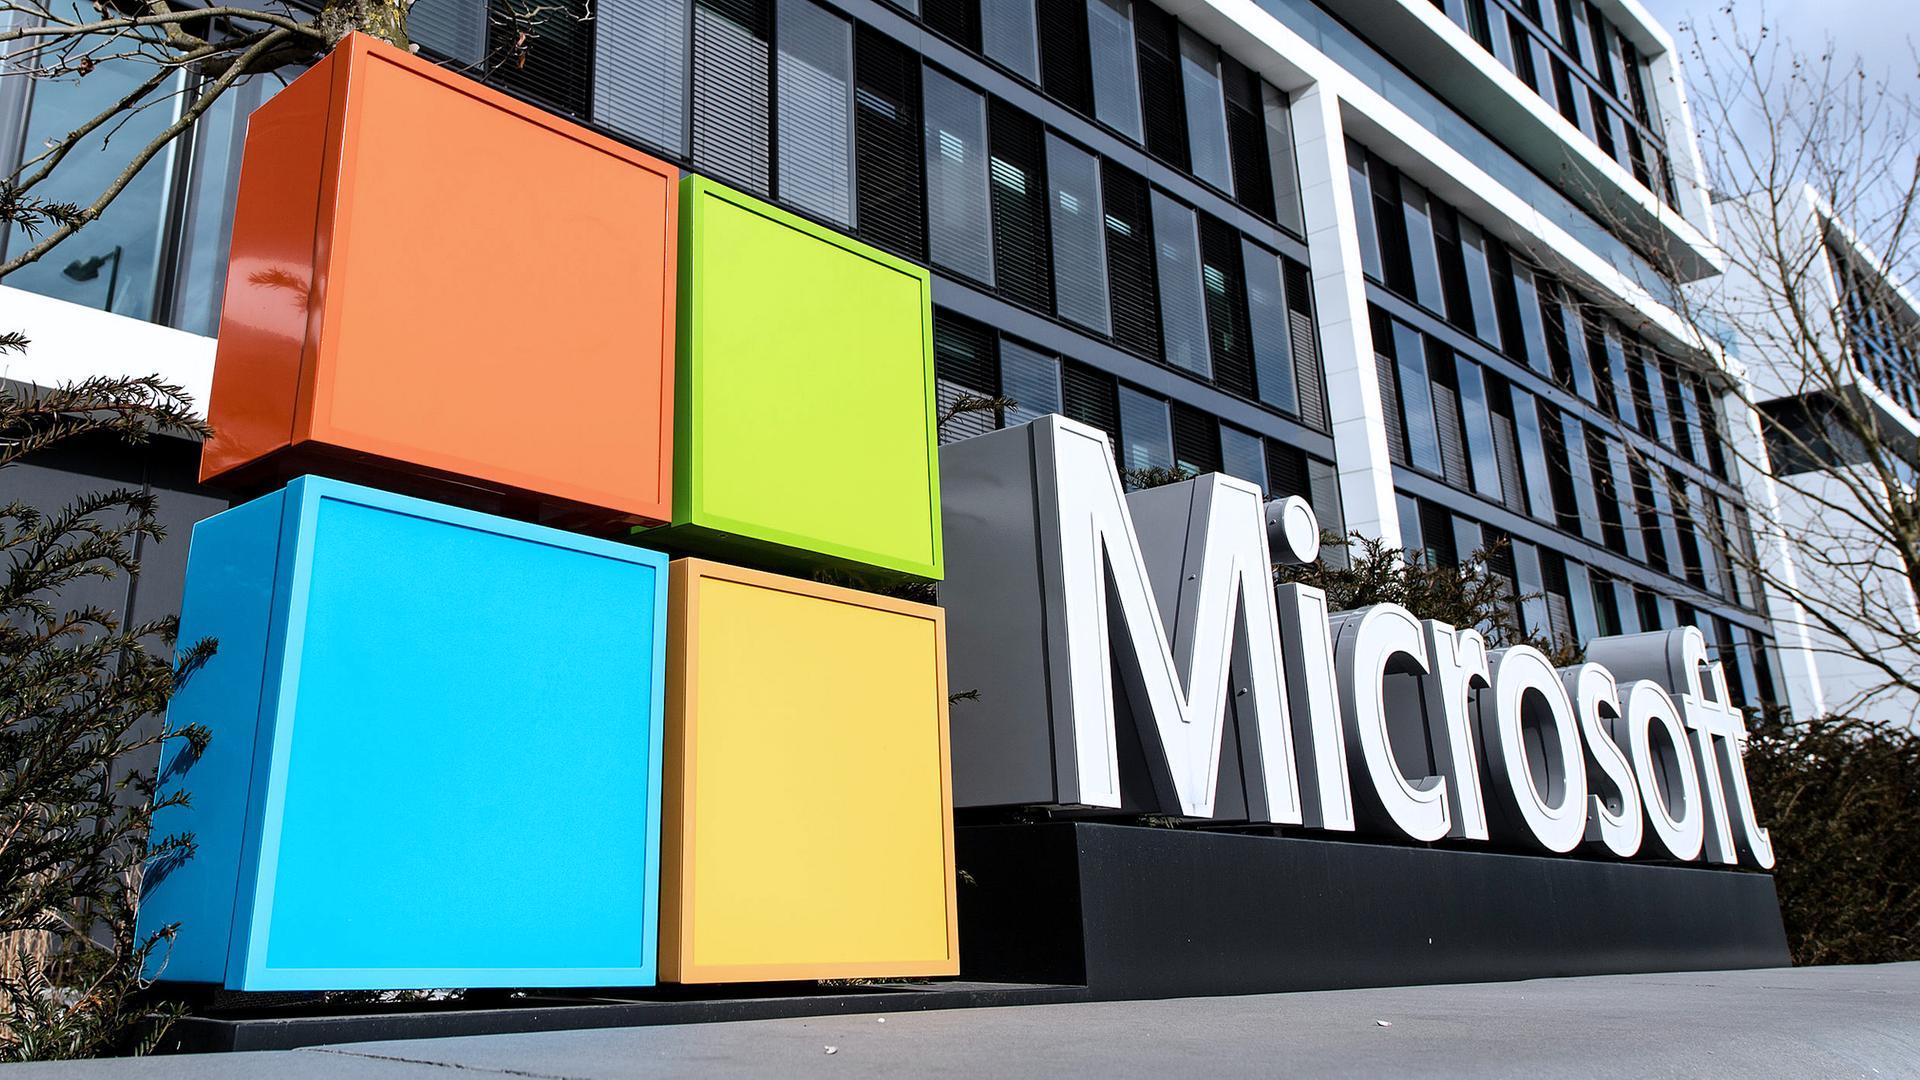 US-Steuerreform verhagelt Microsoft-Bilanz - ZDFmediathek